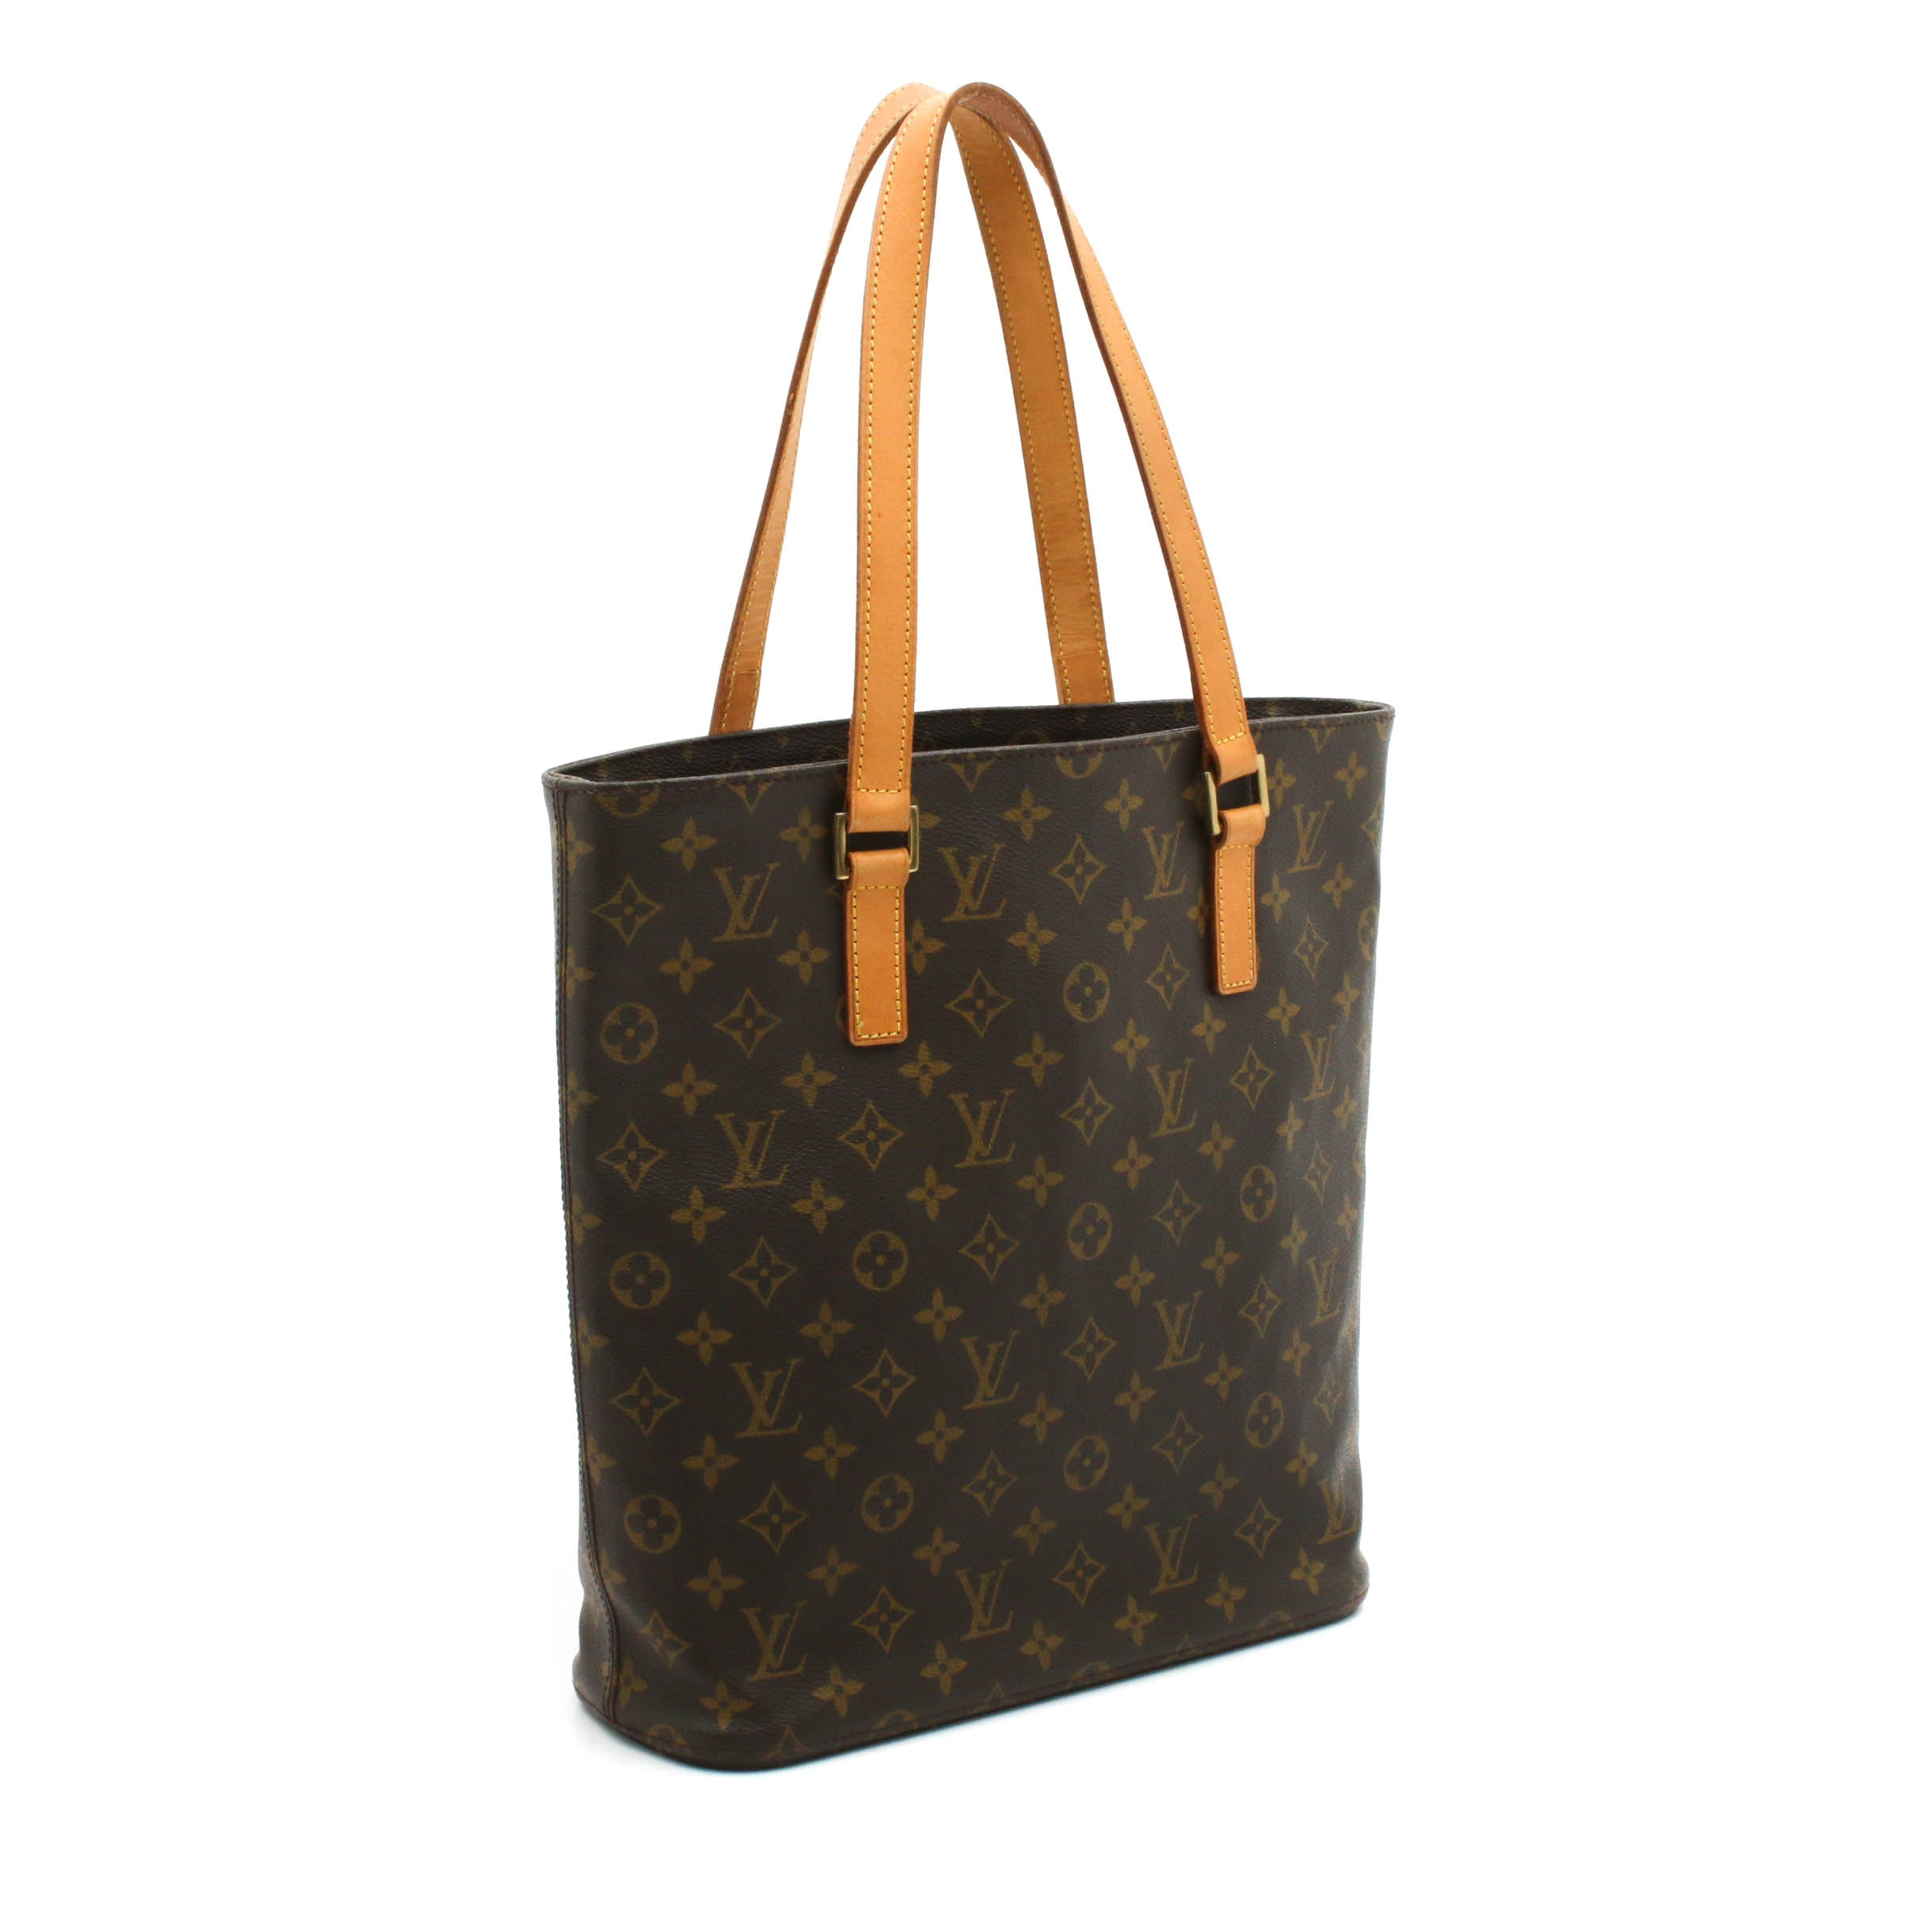 Louis Vuitton Vavin GM Monogram Canvas Shopper Tote